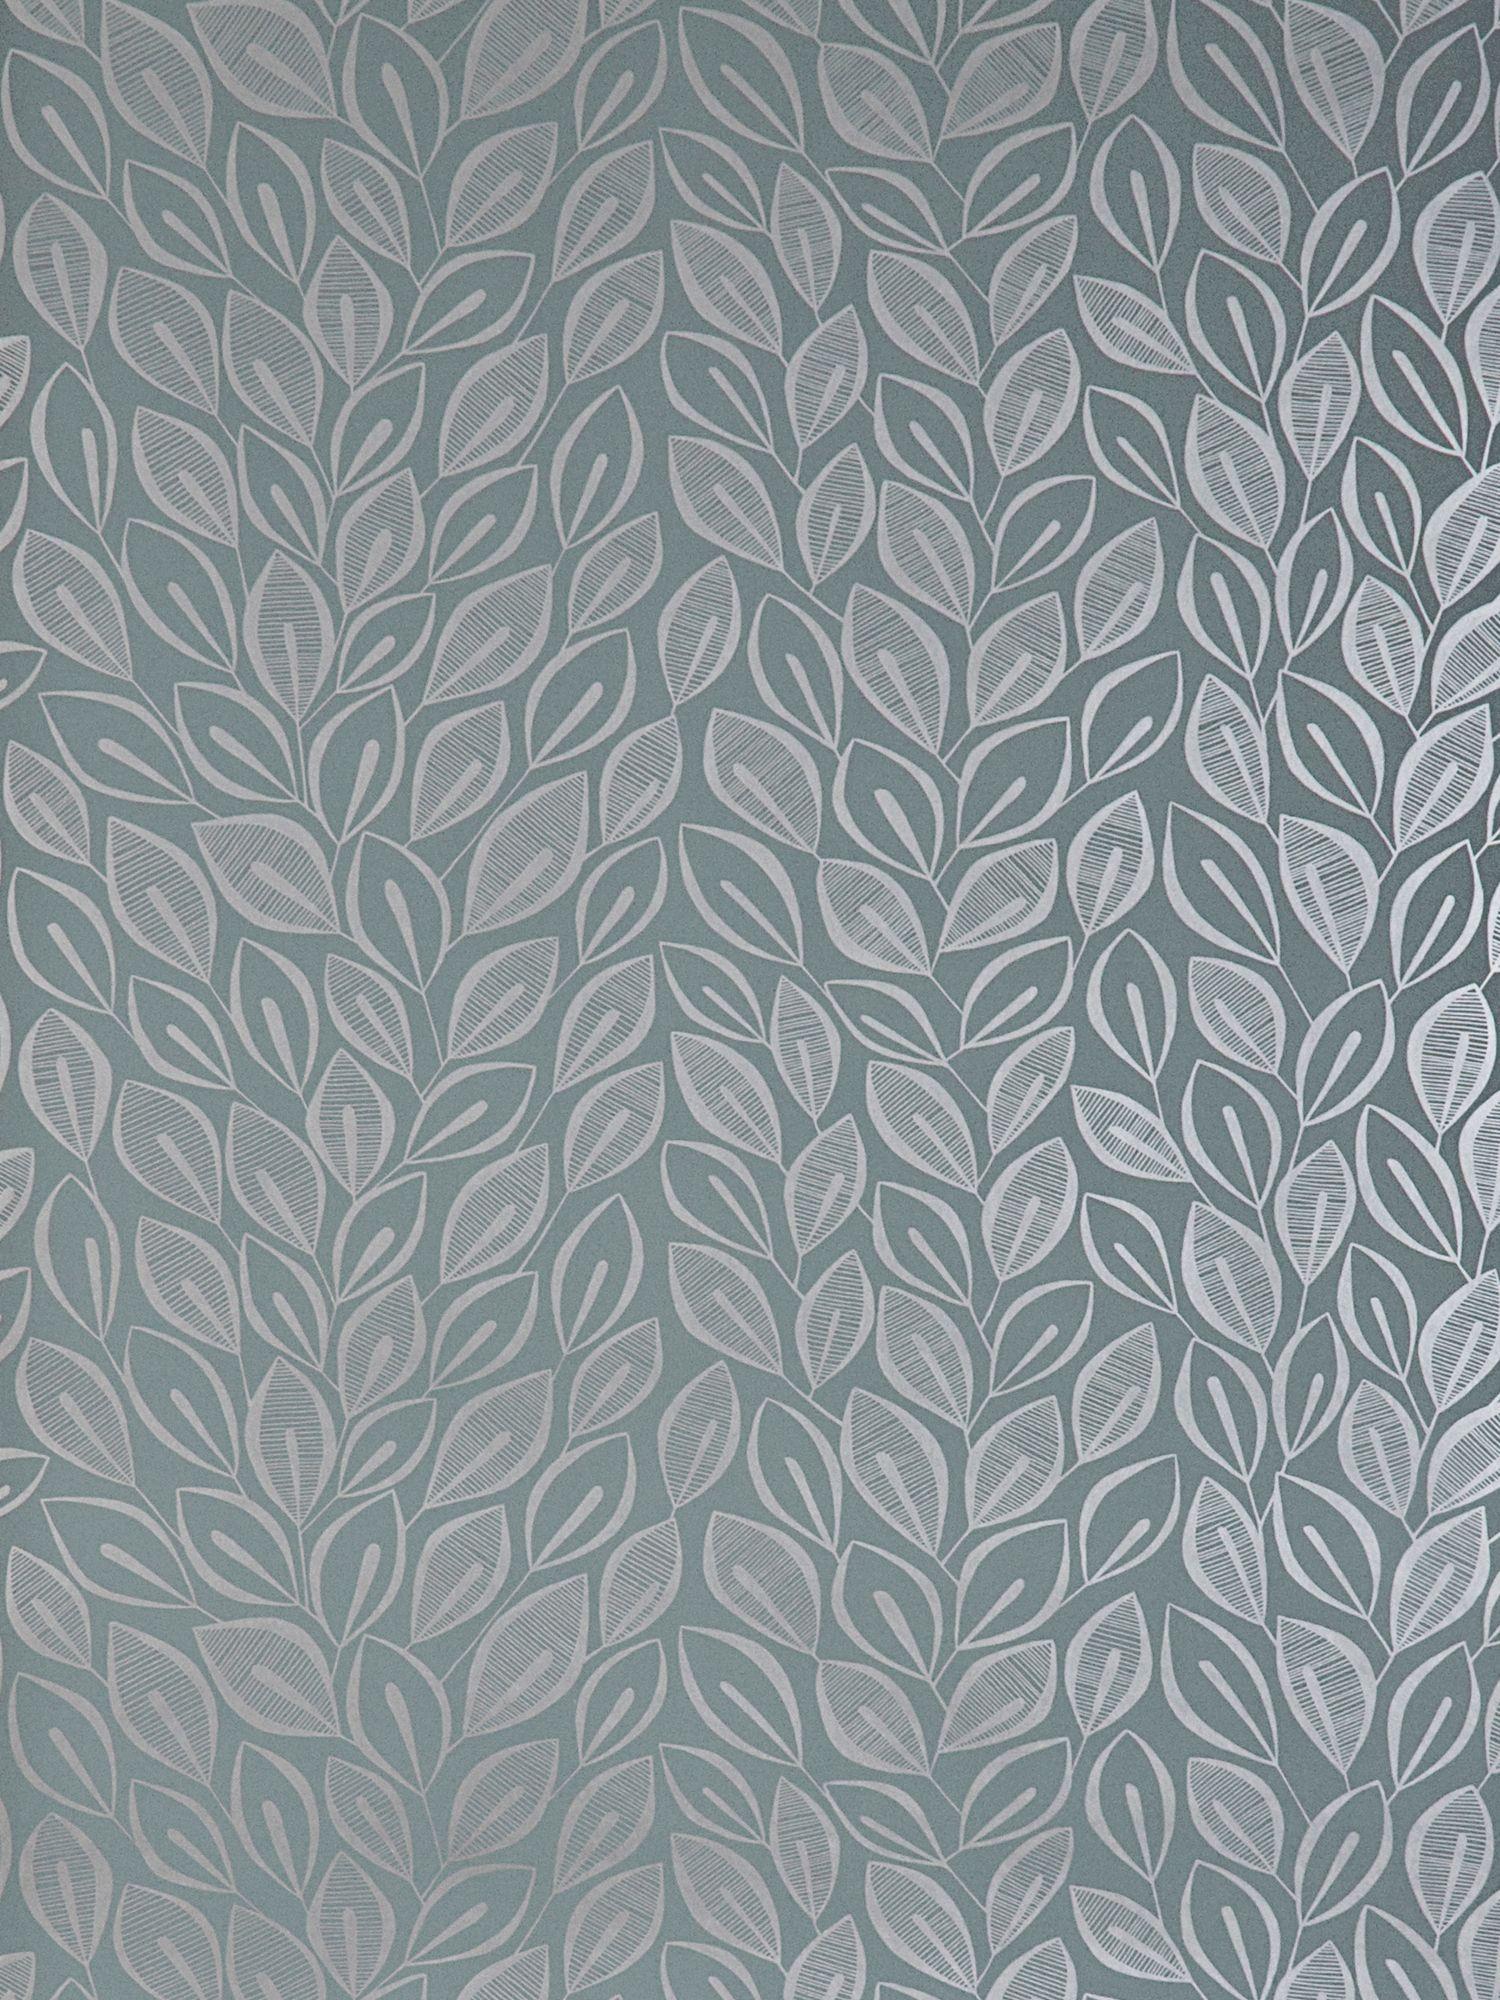 MissPrint MissPrint Leaves Wallpaper